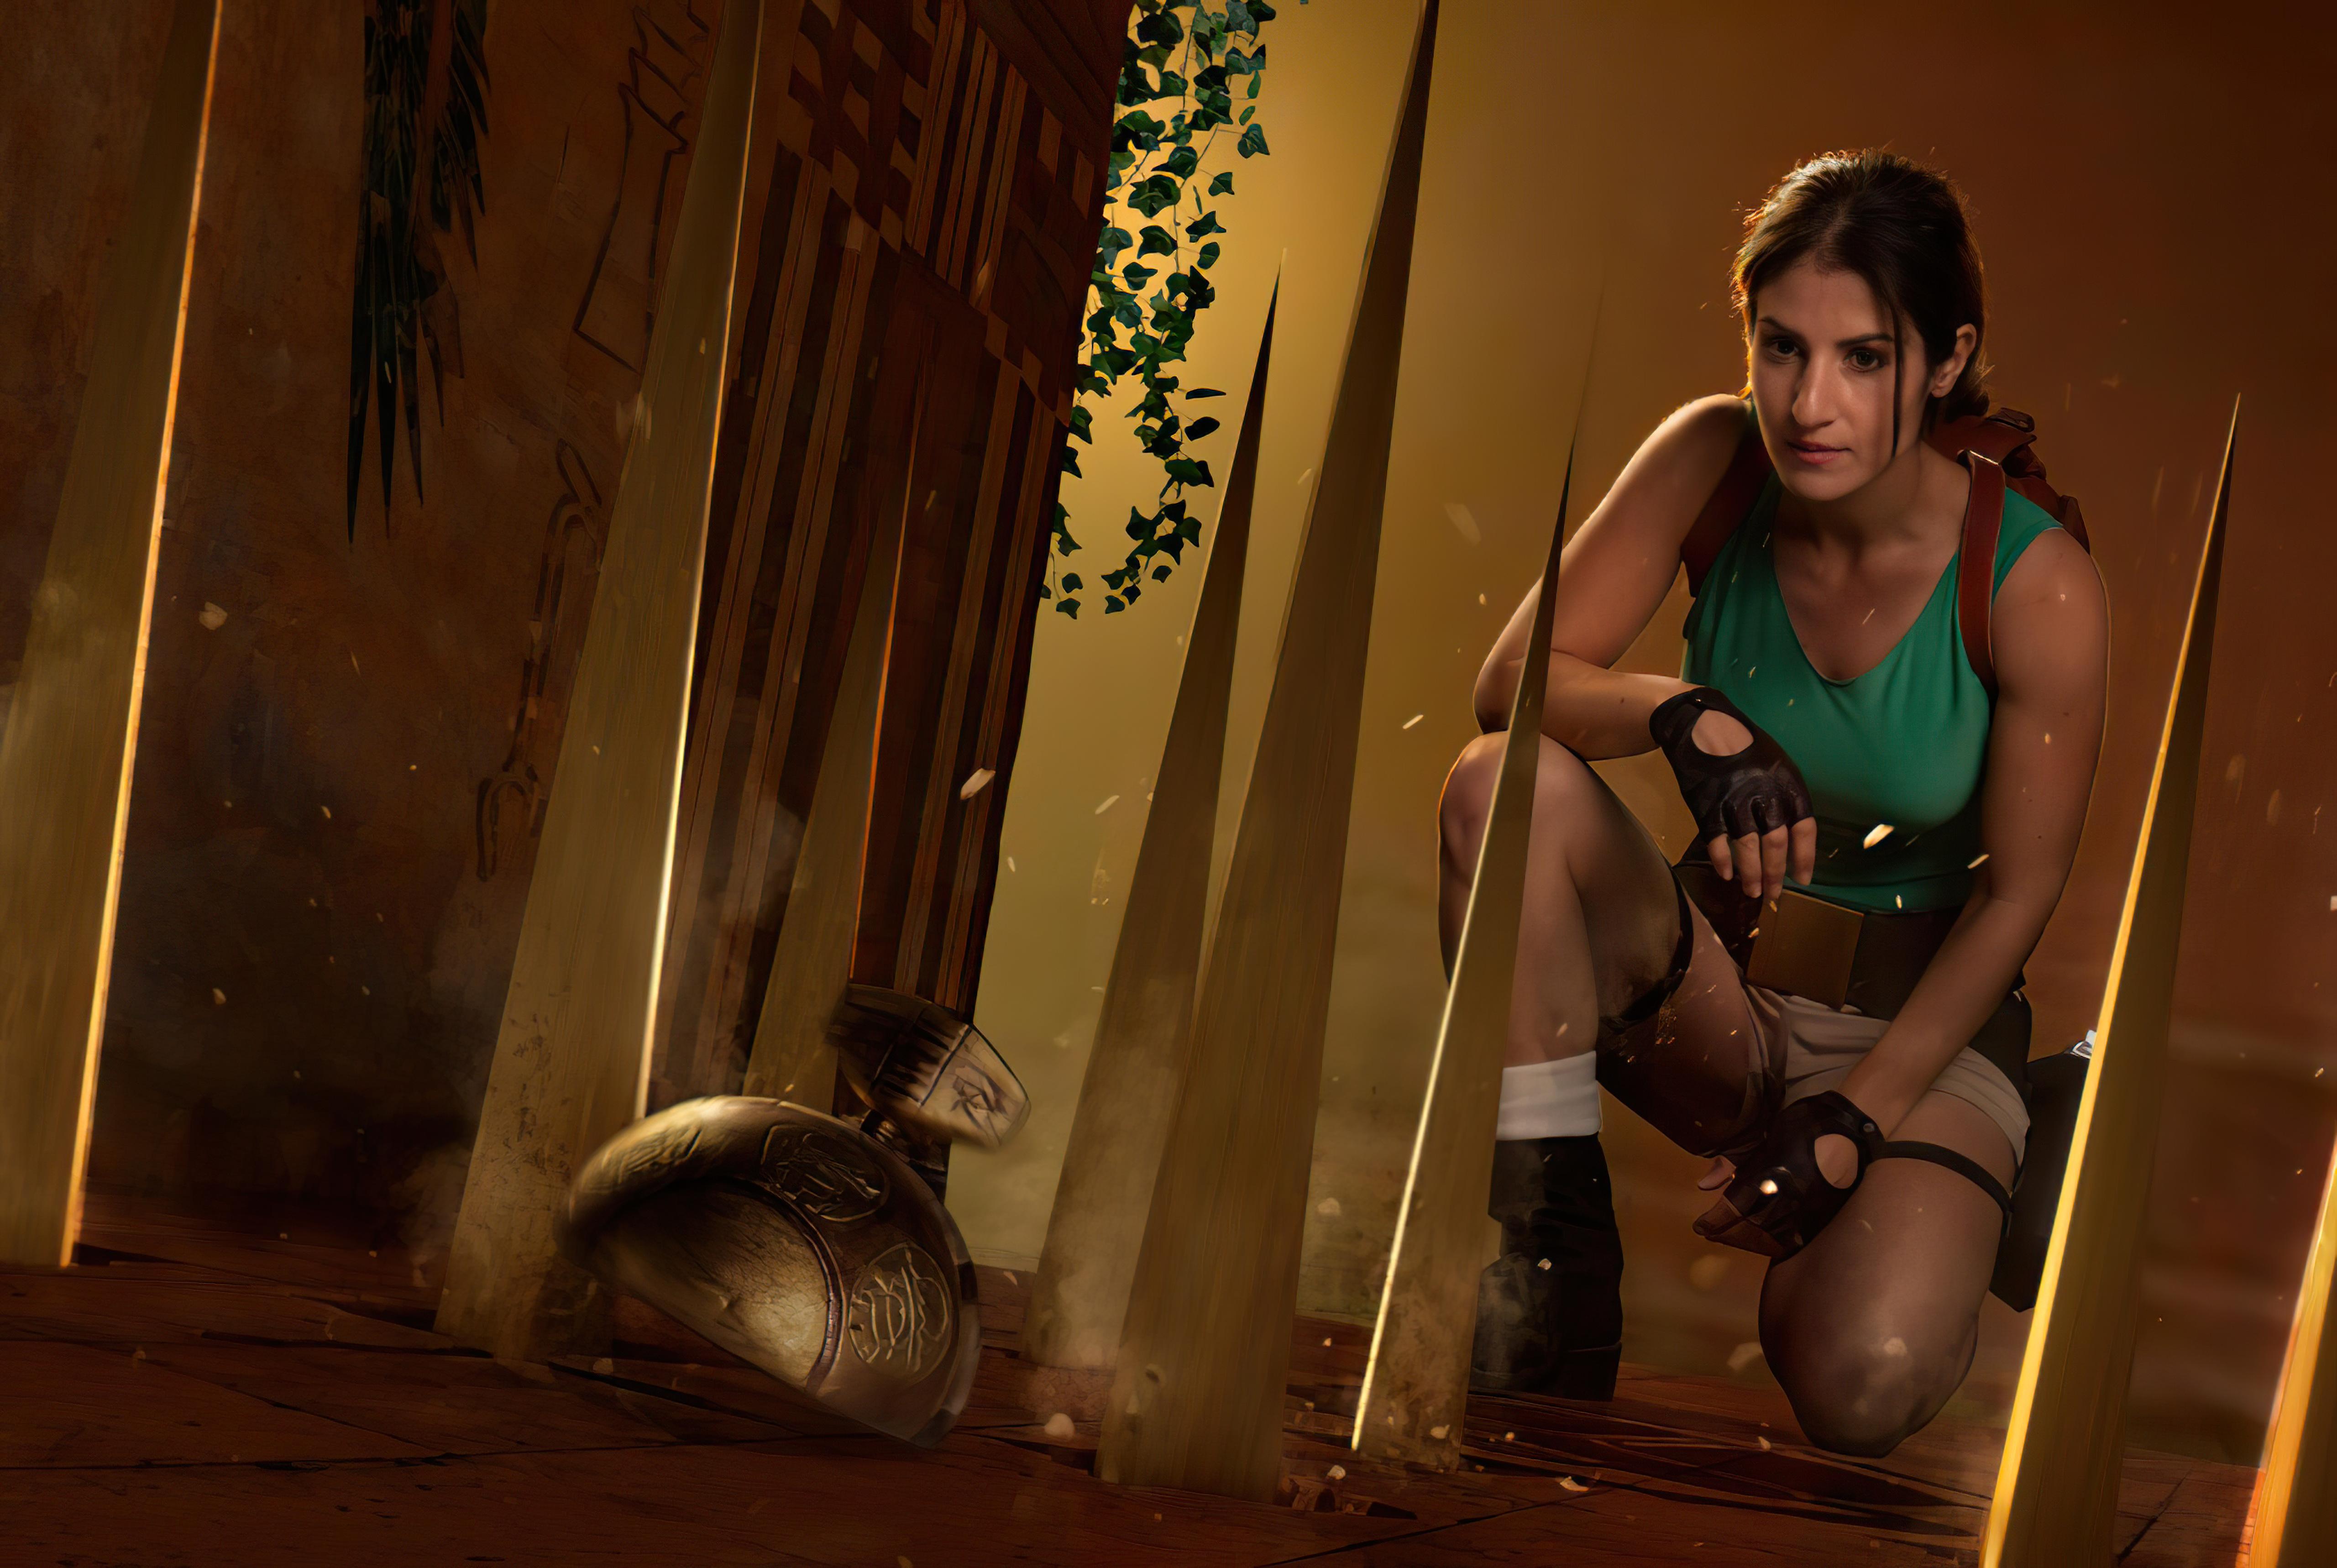 Fondos de pantalla Tomb Raider 4 Lara Croft Cosplay